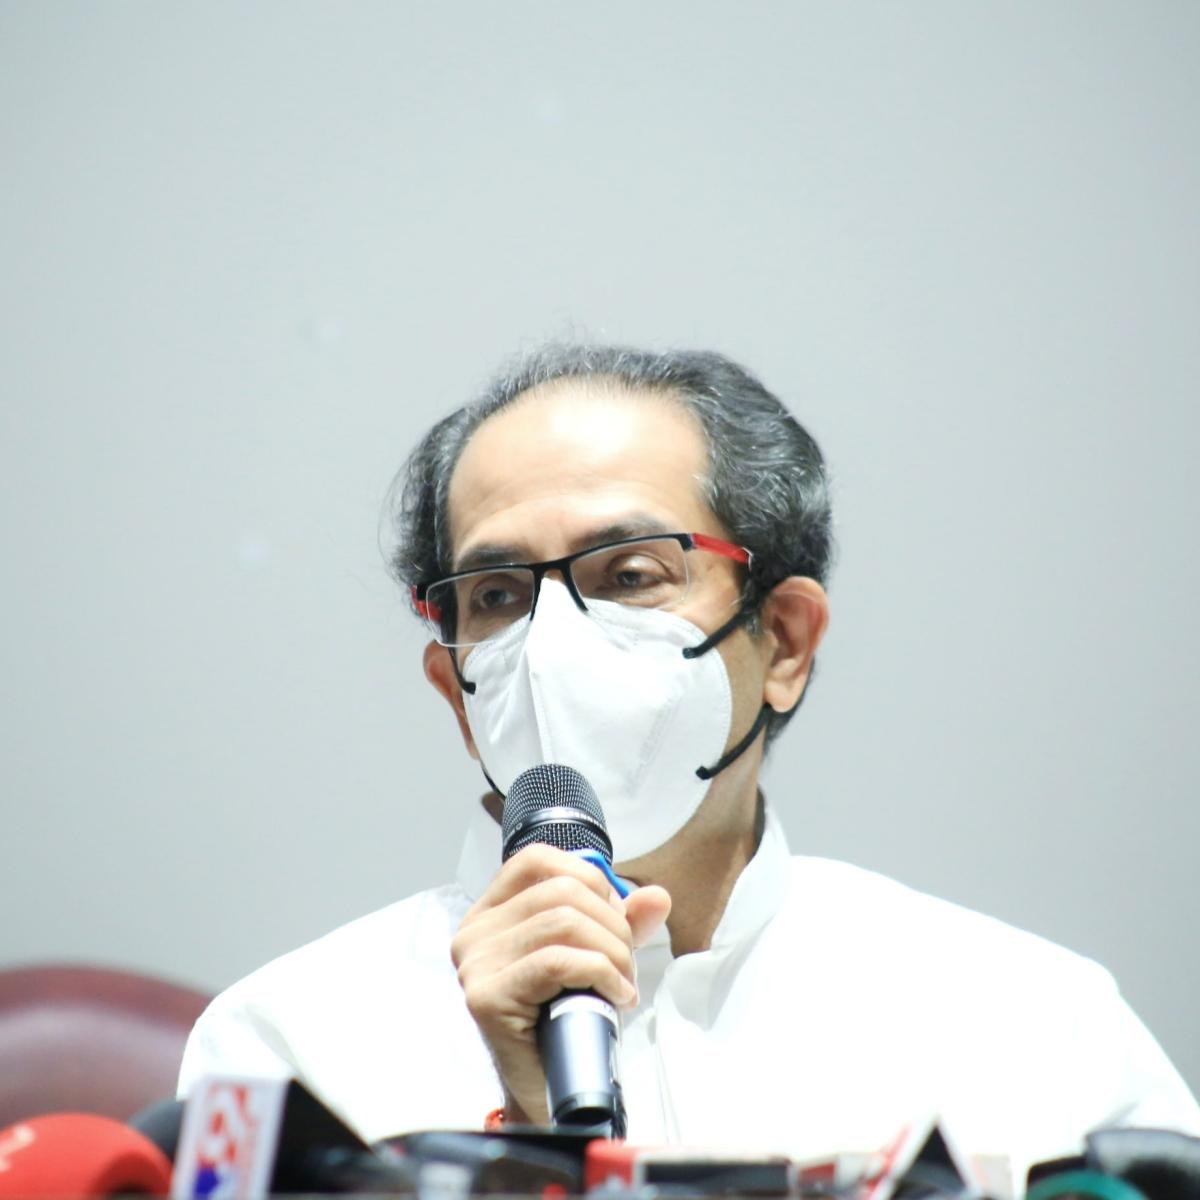 Mumbai local trains for all? Maha CM Uddhav Thackeray says 'decision to be taken soon'